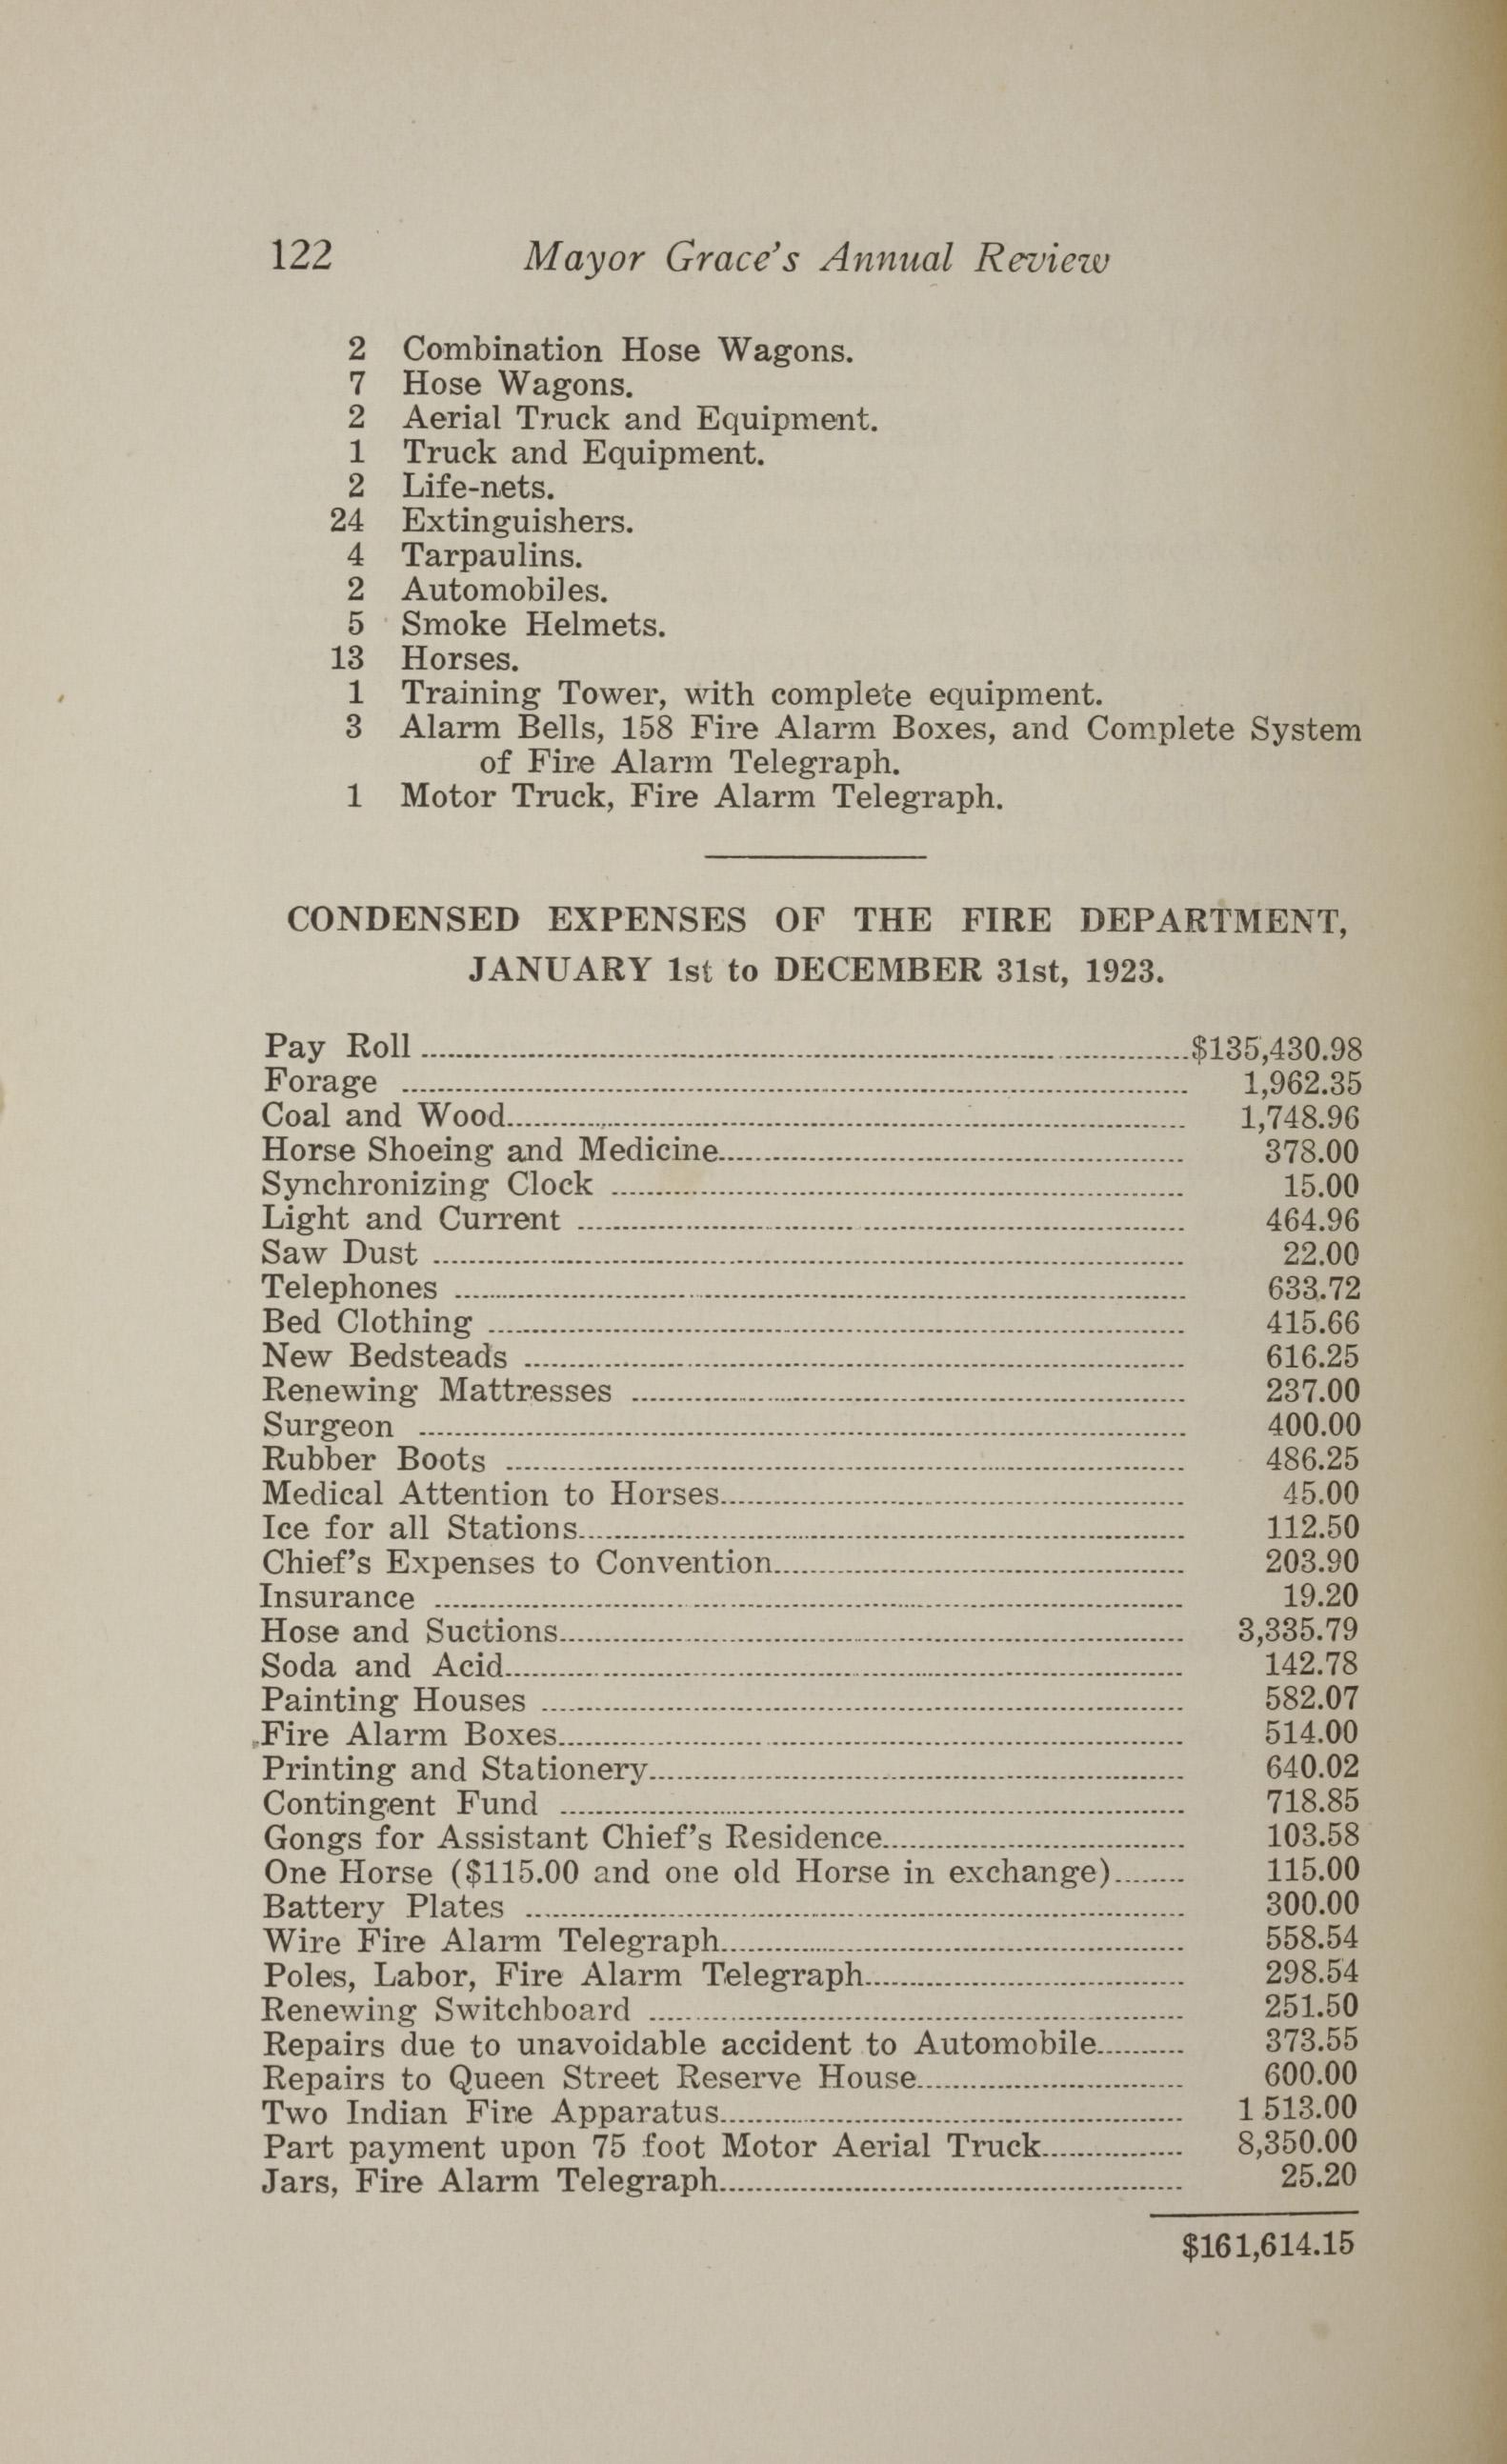 Charleston Yearbook, 1923, page 122